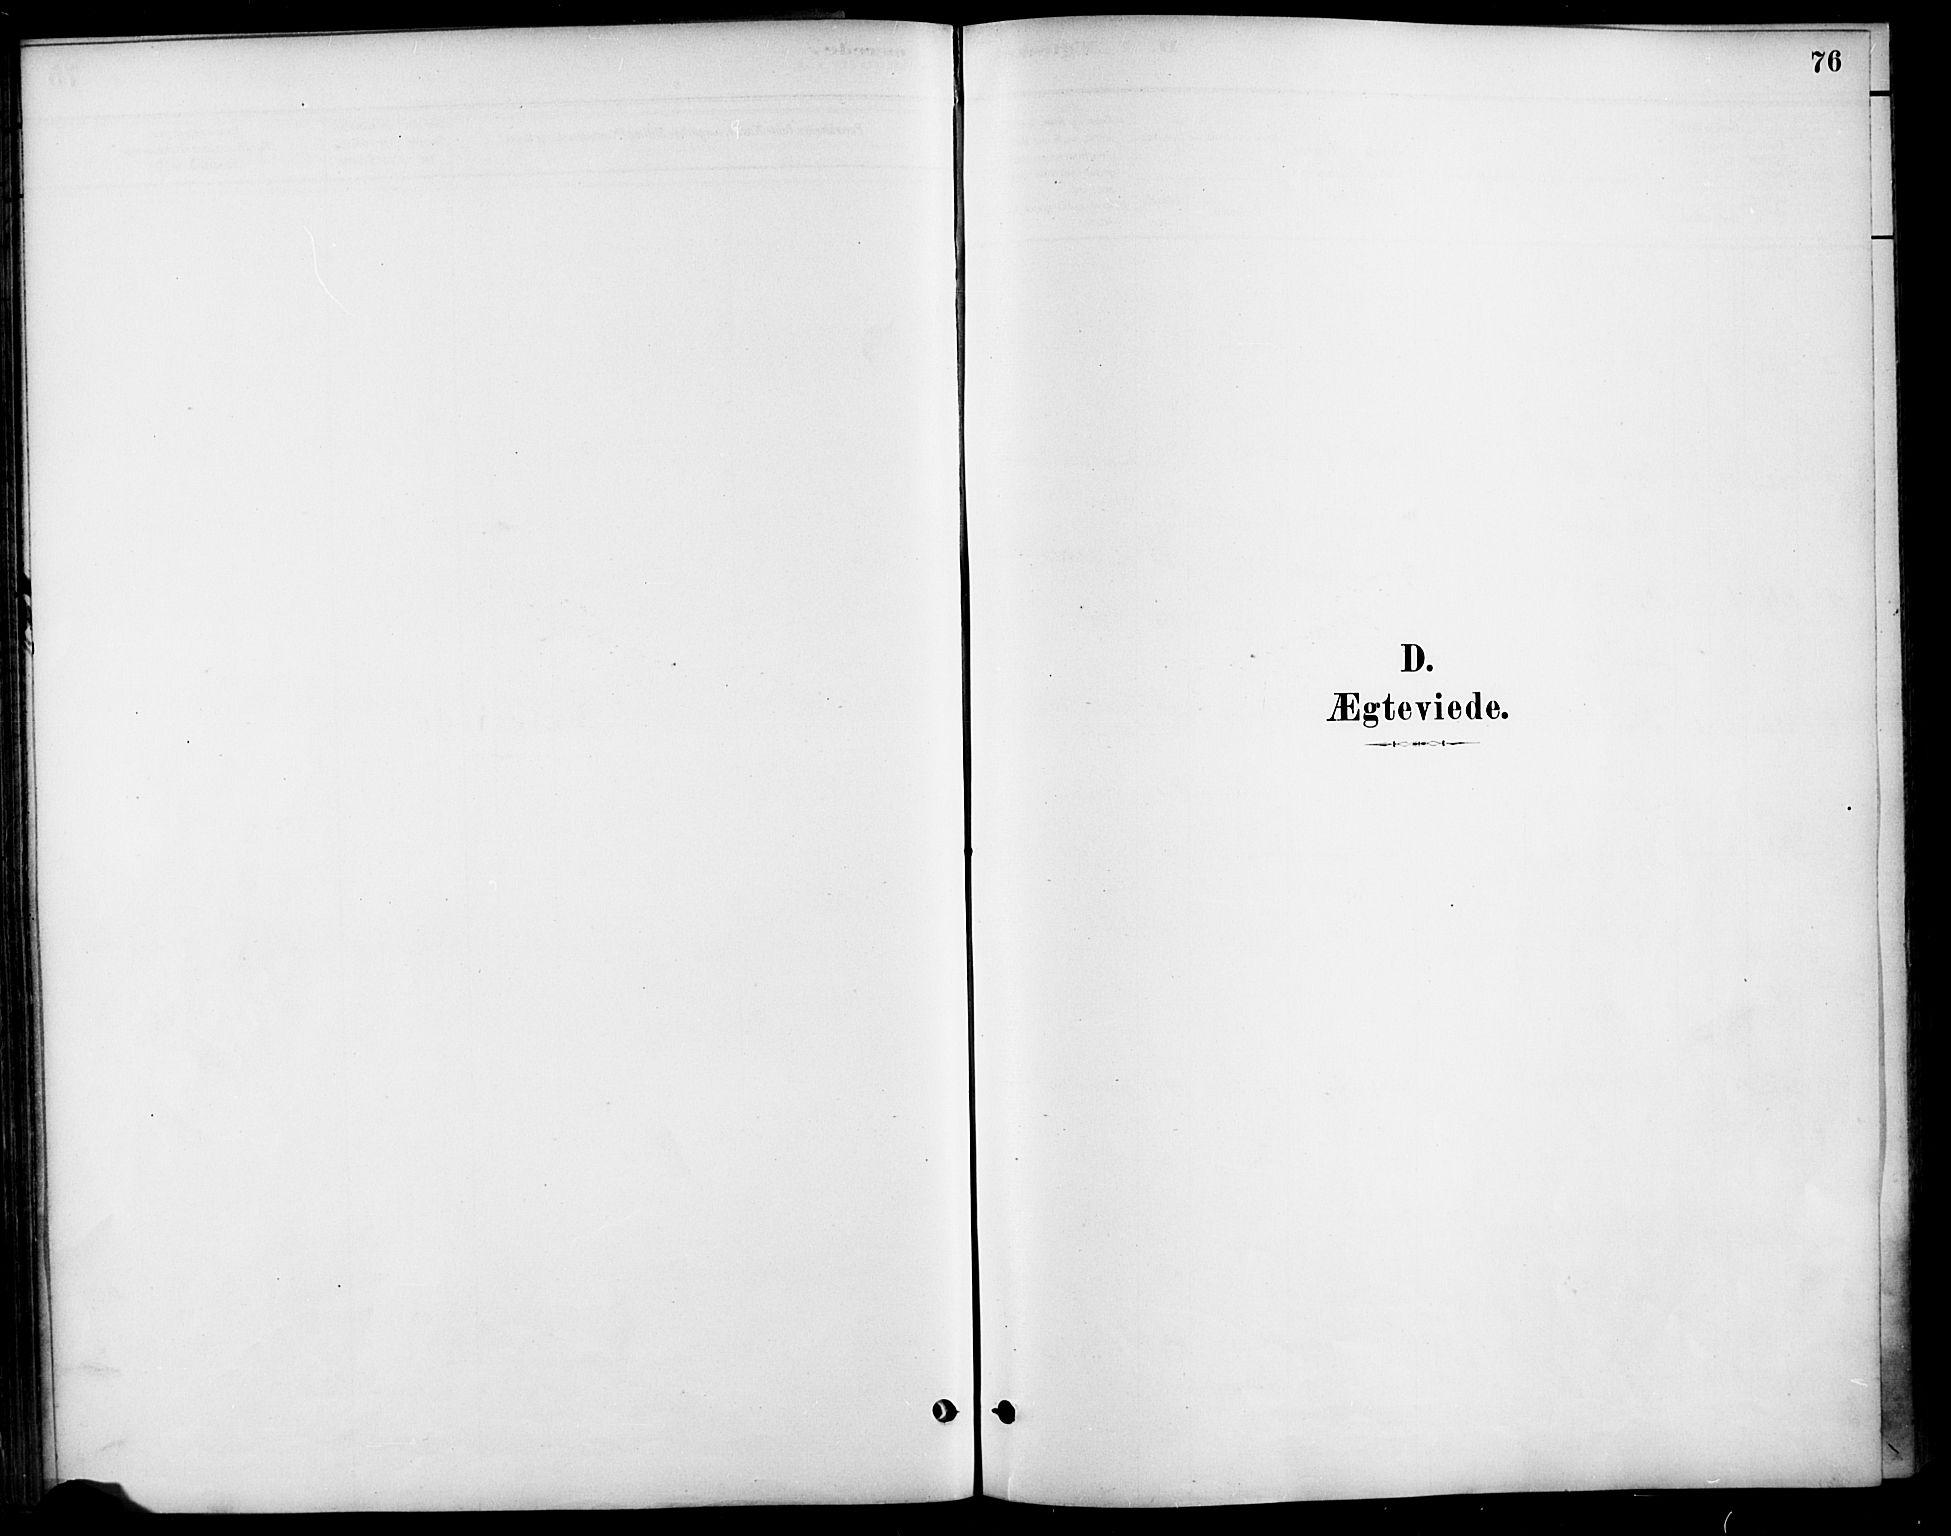 SAO, Nannestad prestekontor Kirkebøker, F/Fa/L0014: Ministerialbok nr. I 14, 1881-1890, s. 76